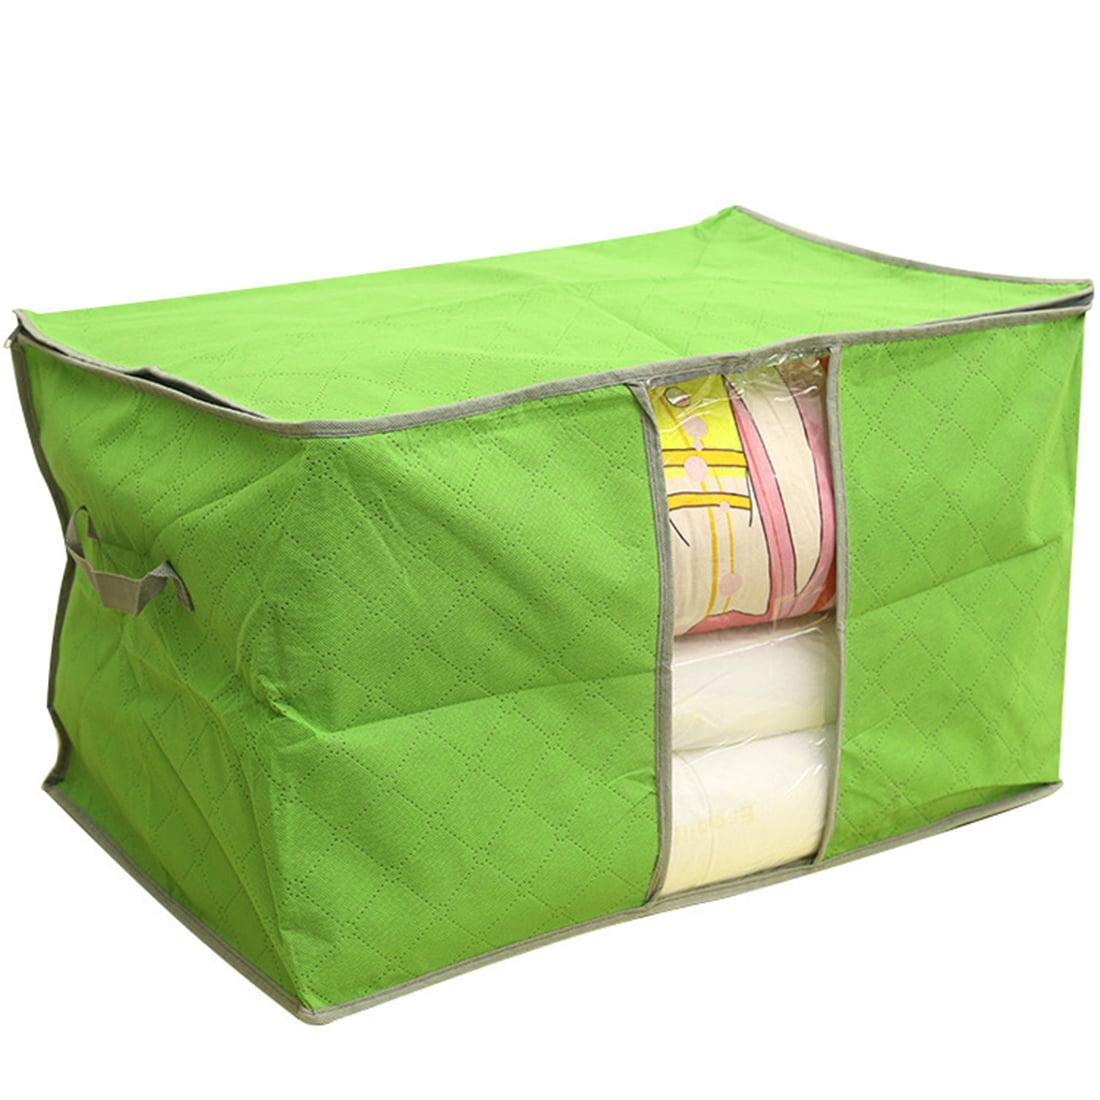 Bamboo Charcoal Zipper Grips Cloths Quilt Bedding Storage Bag Orange 58x41x35cm